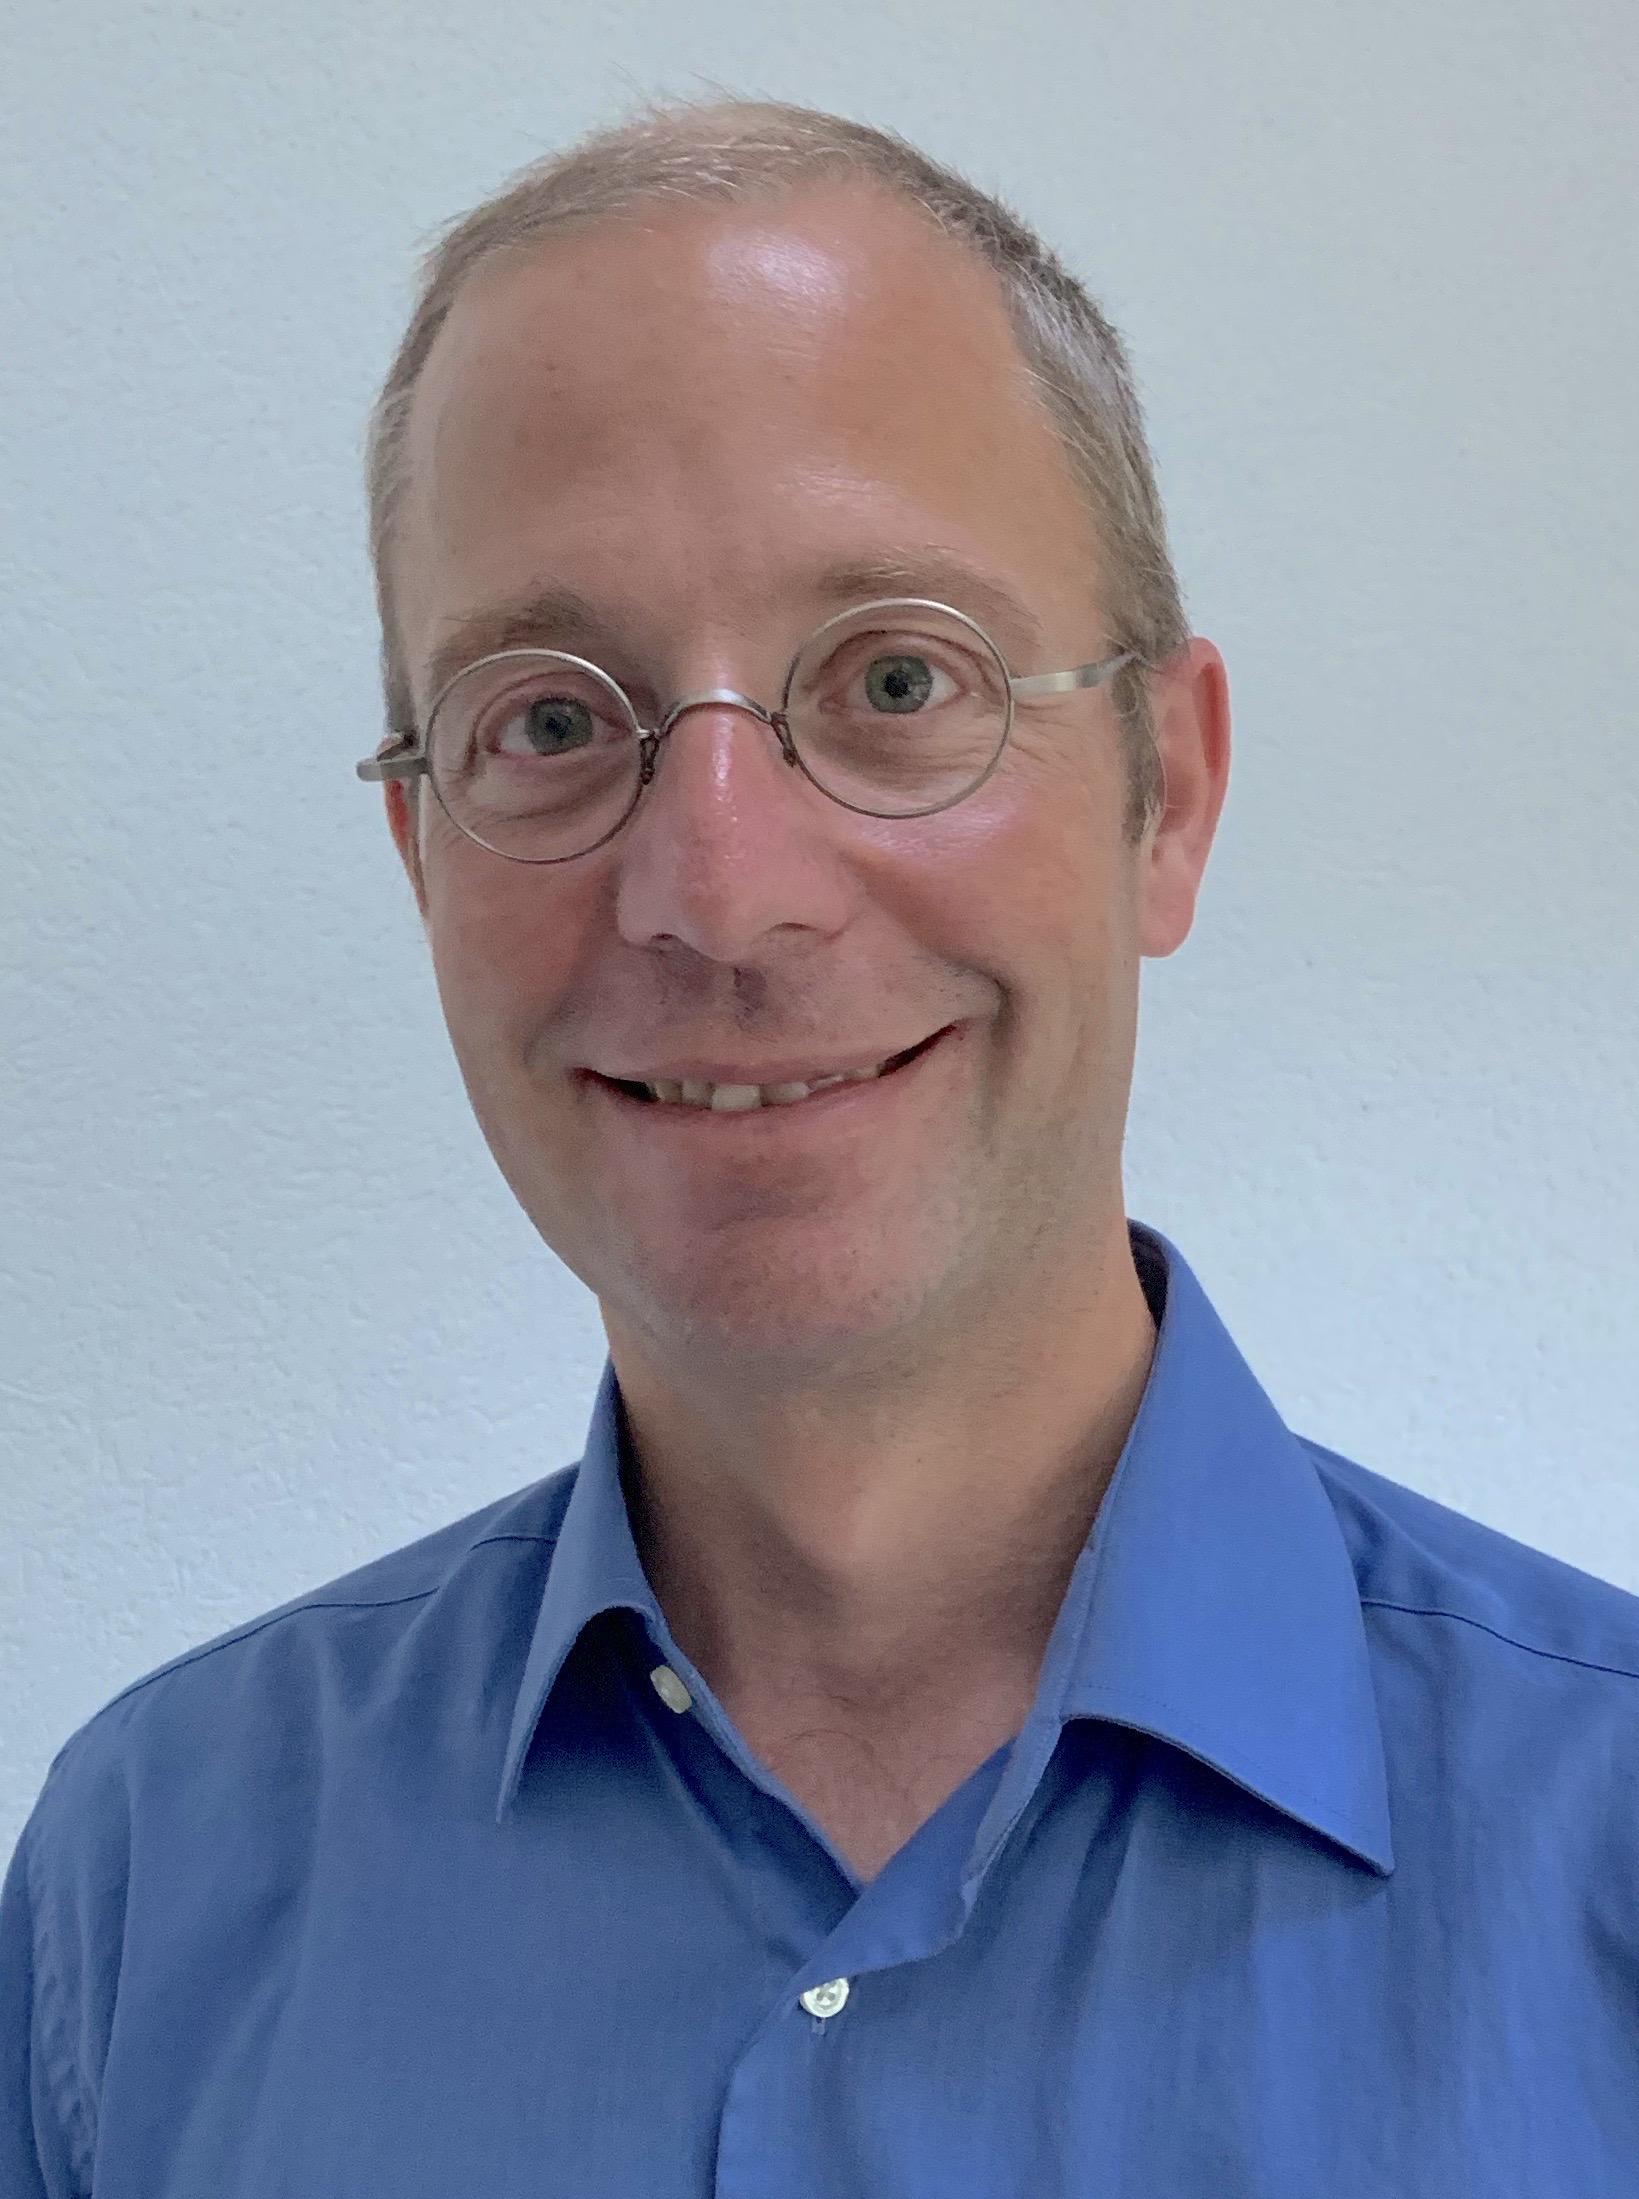 Philippe Büchler, ARTORG Center